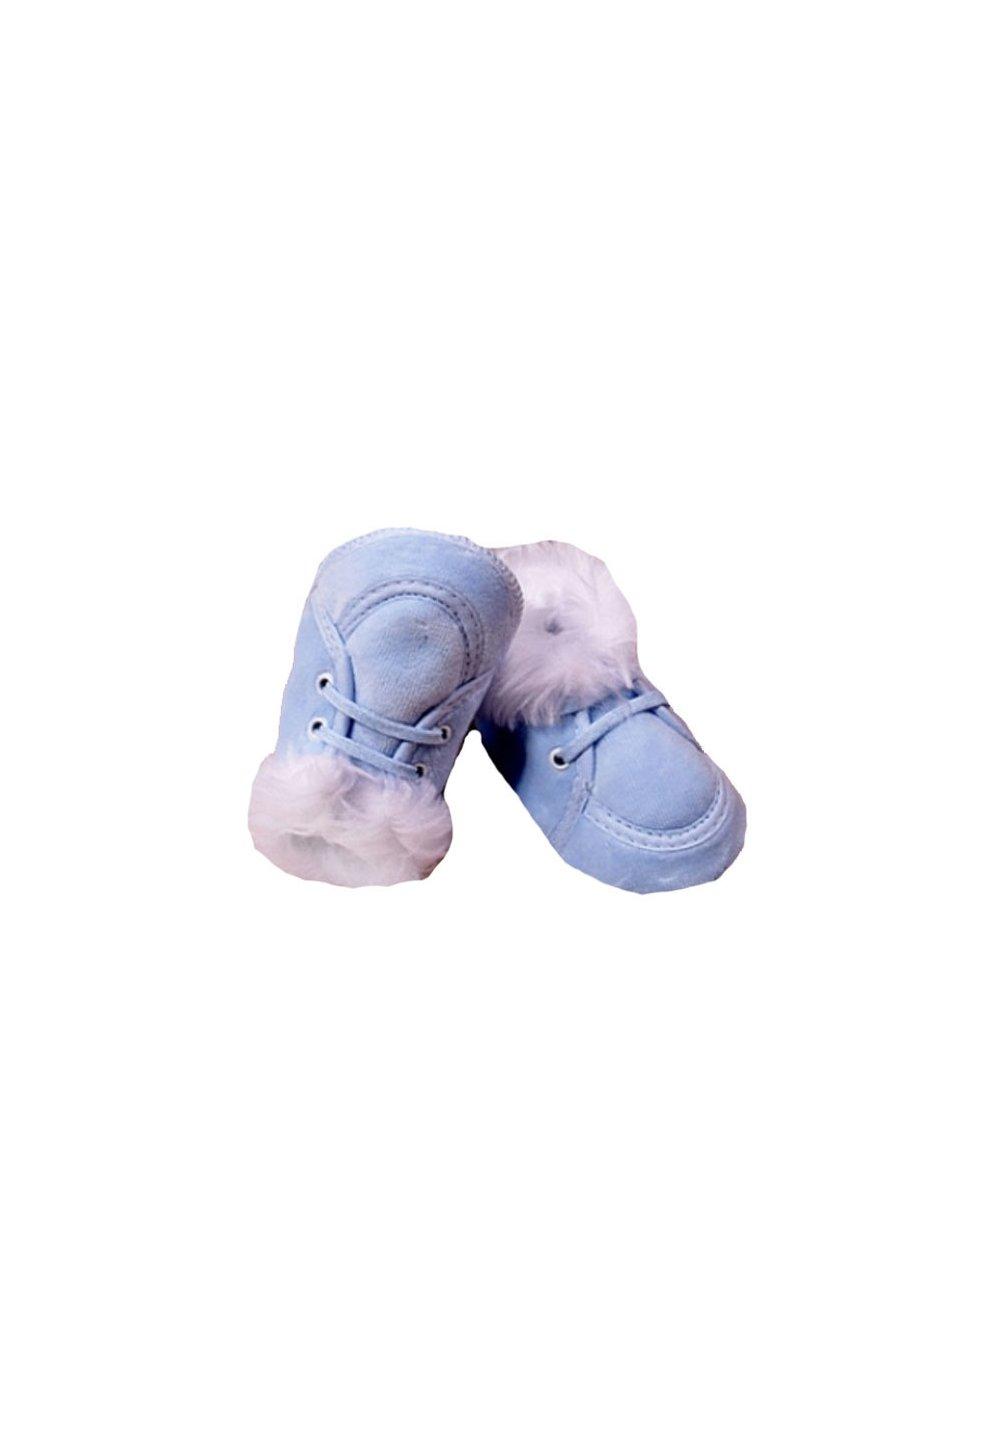 Papucei bebe, cu siret, albastri , imagine